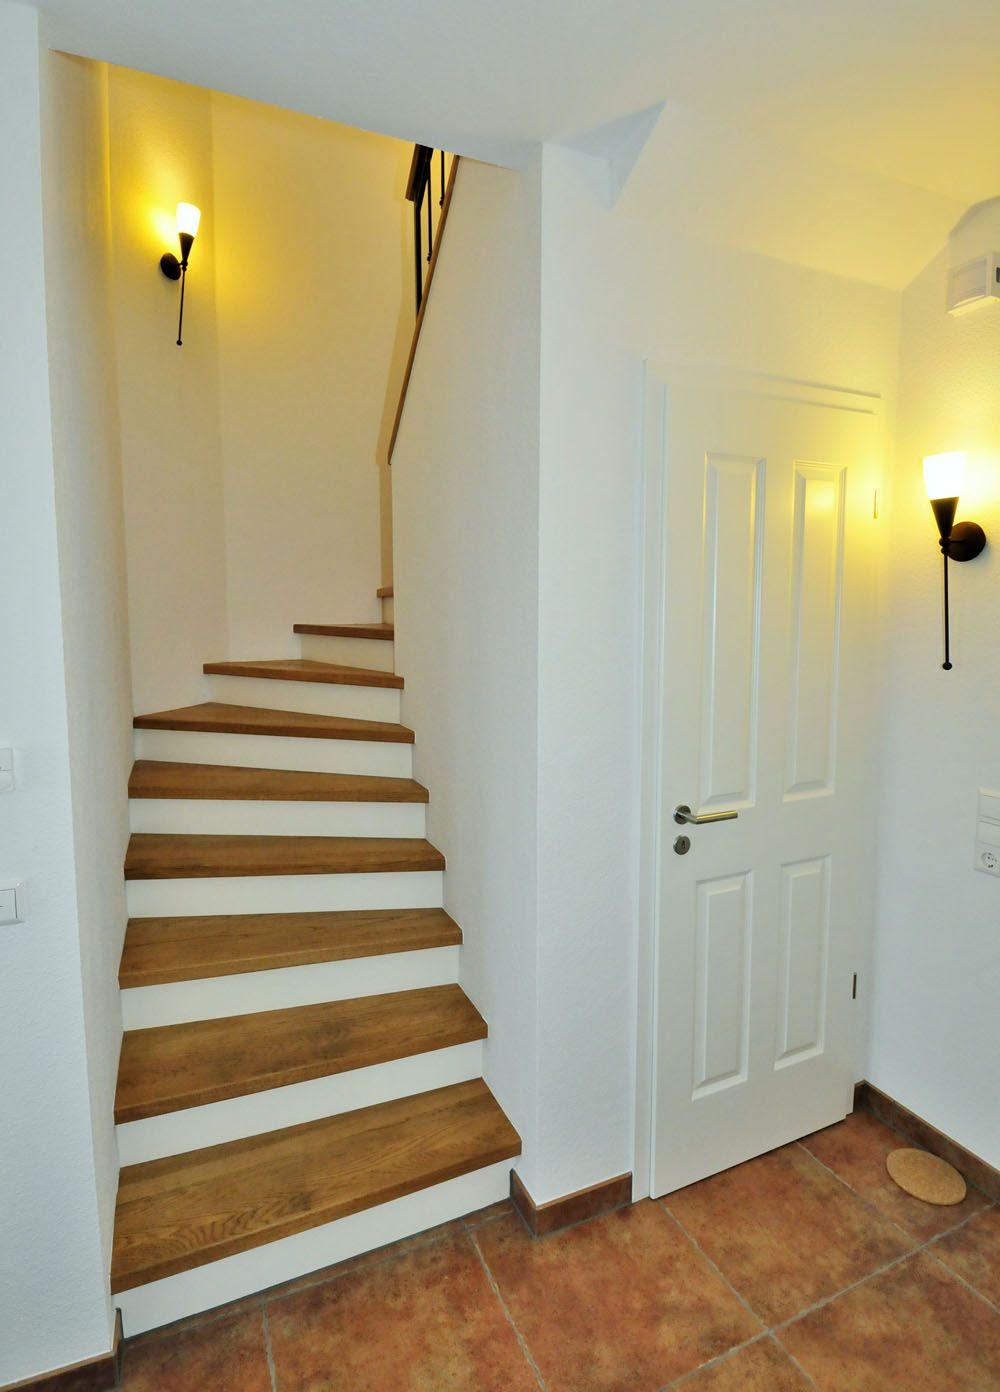 Haus außentor design betontreppemitholz   gegenteile  pinterest  future house